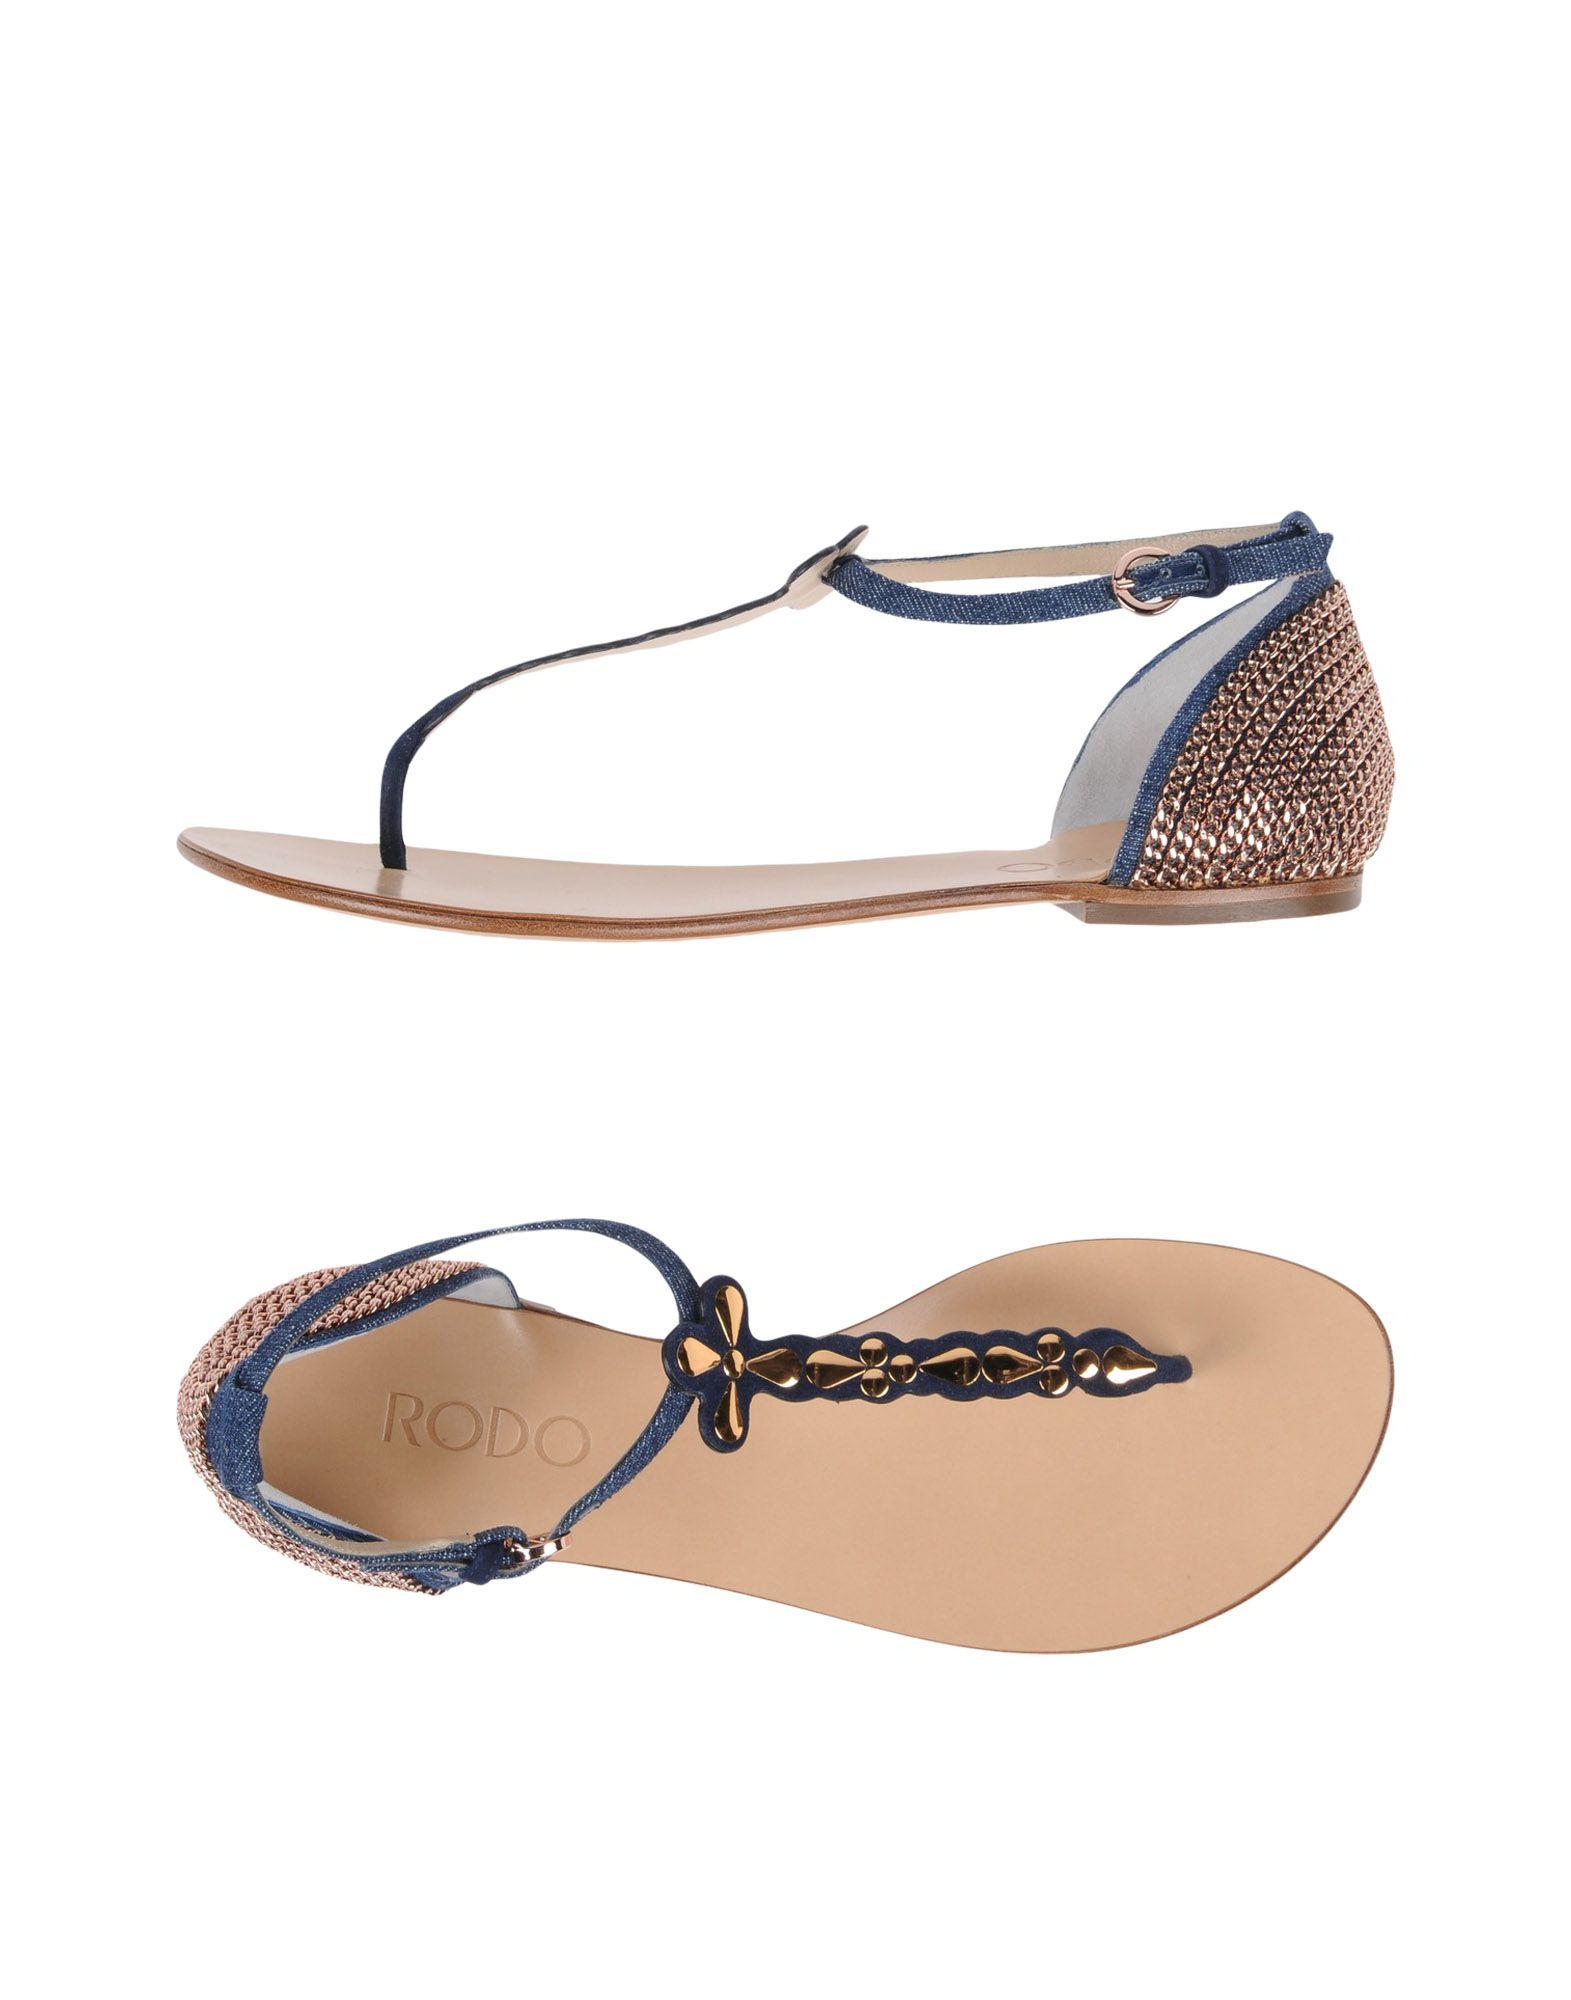 Stilvolle billige Dianetten Schuhe Rodo Dianetten billige Damen  11465557NT e703c5